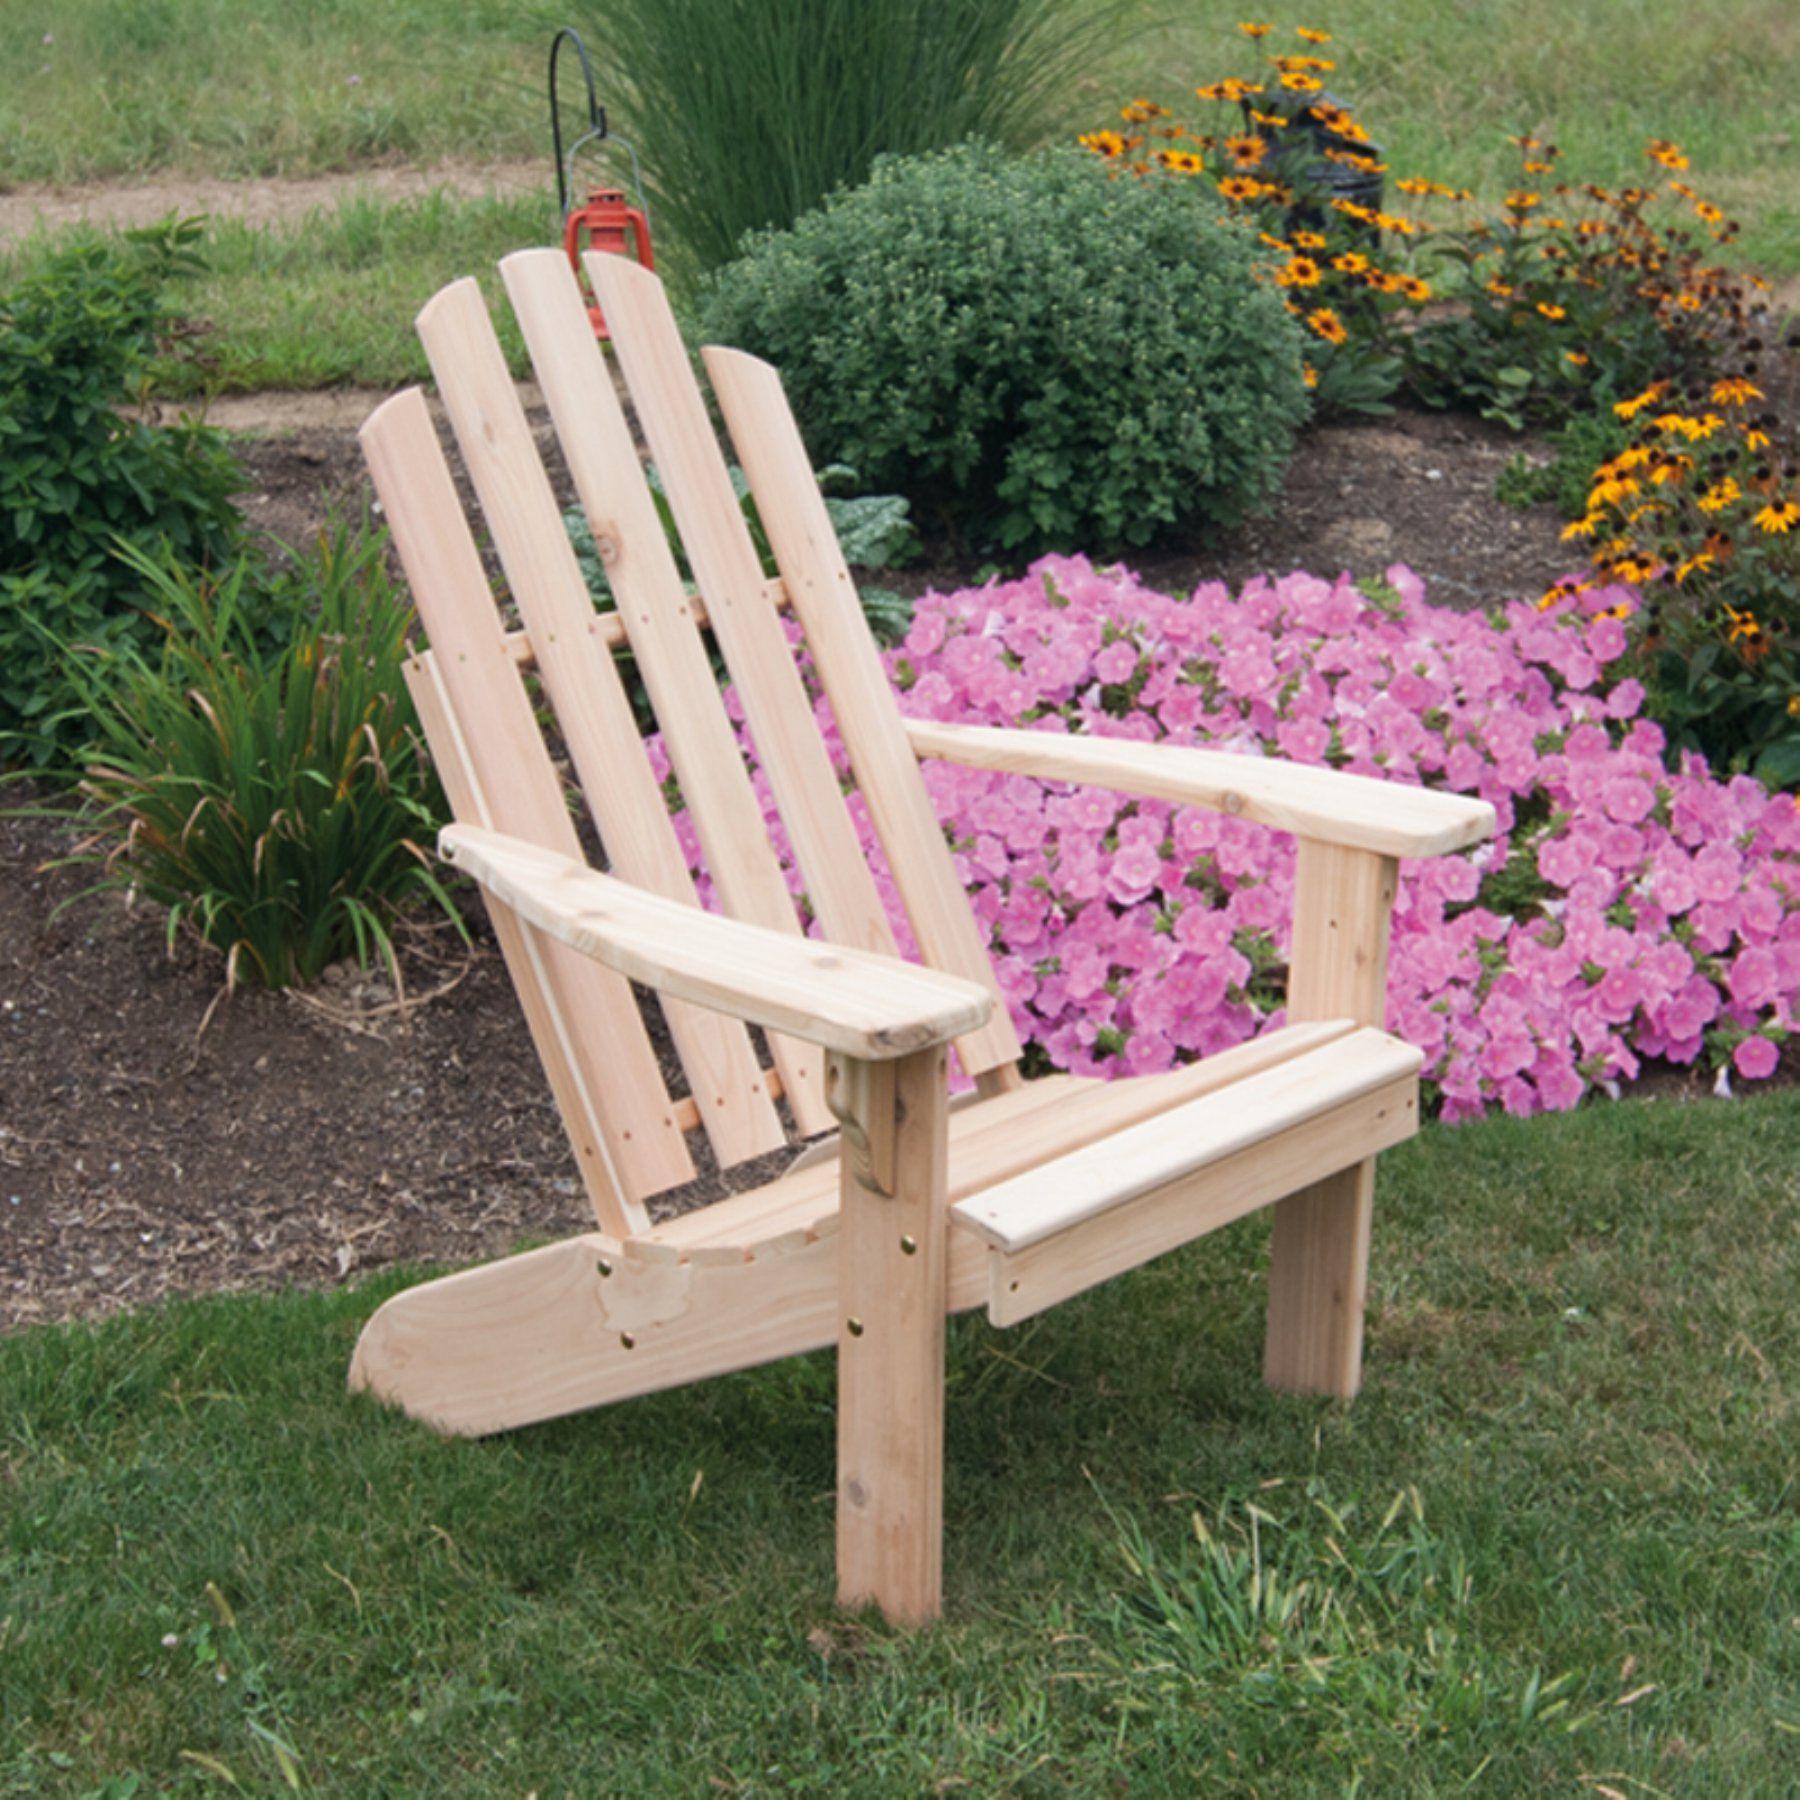 Outdoor a u l furniture kennebunkport western red cedar adirondack